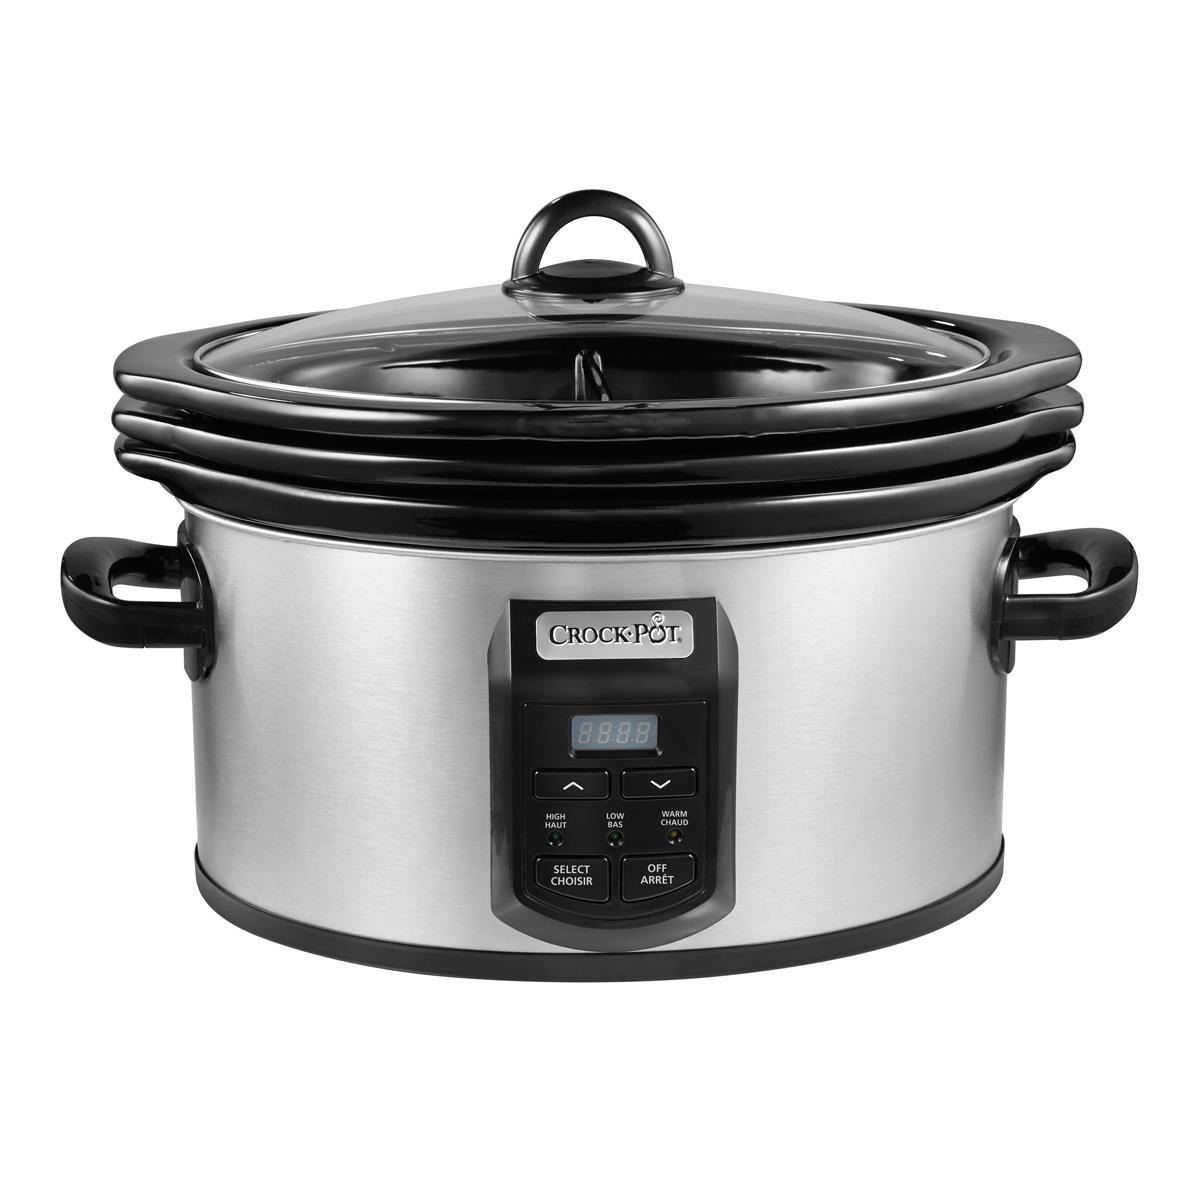 Crock-Pot® Choose-A-Crock 2,4,6 Qt. Oval Programmable Slow